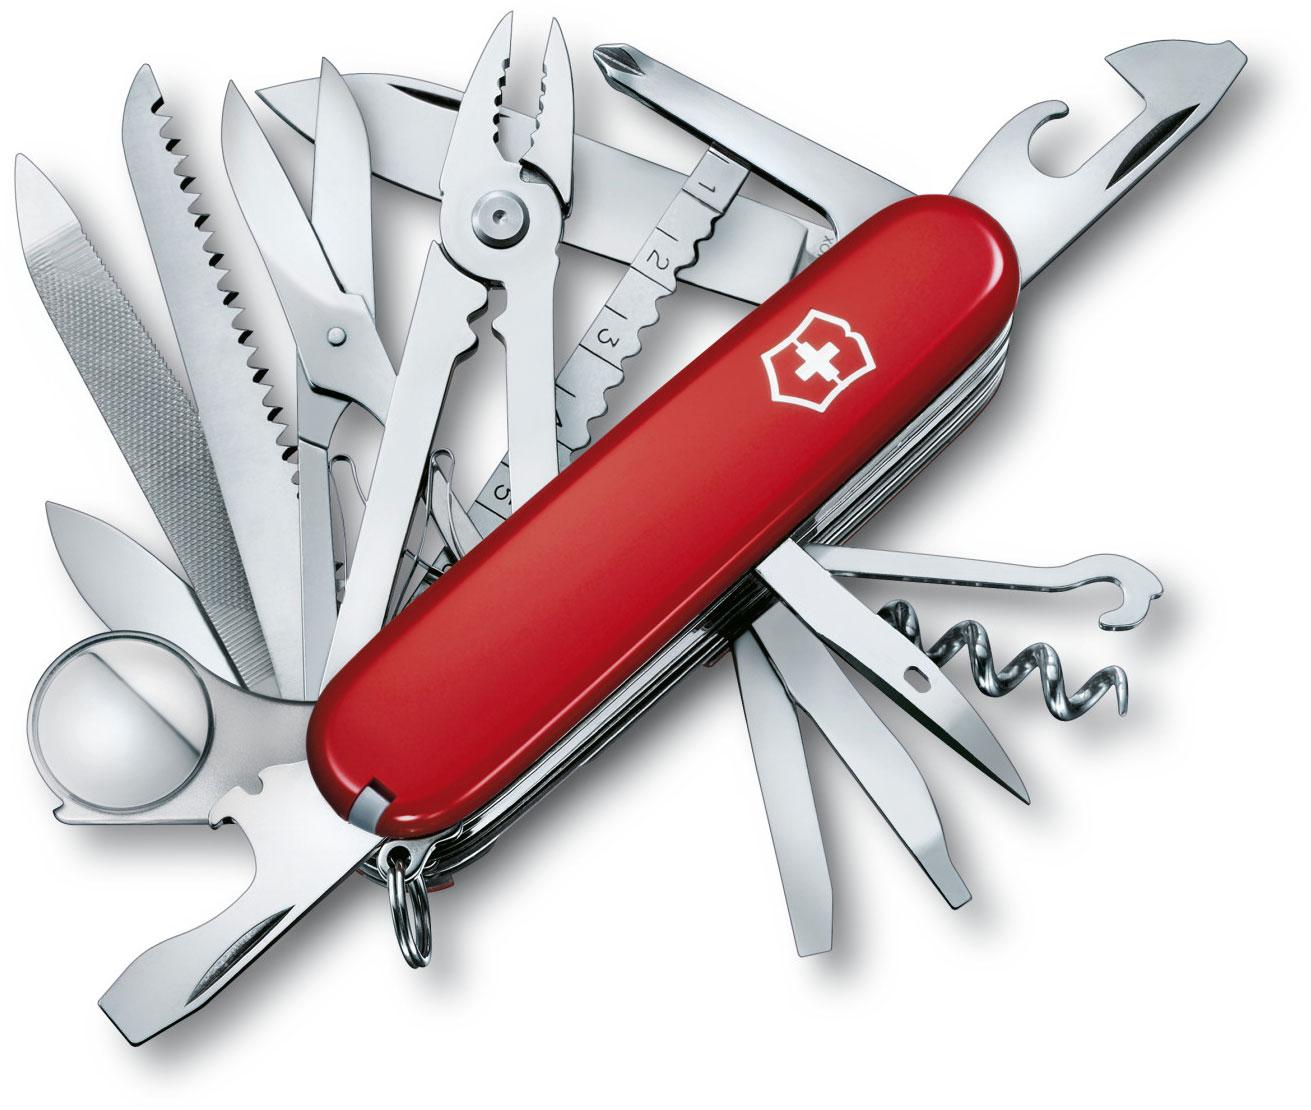 Victorinox Swiss Army SwissChamp Multi-Tool, Red, 3.58 inch Closed